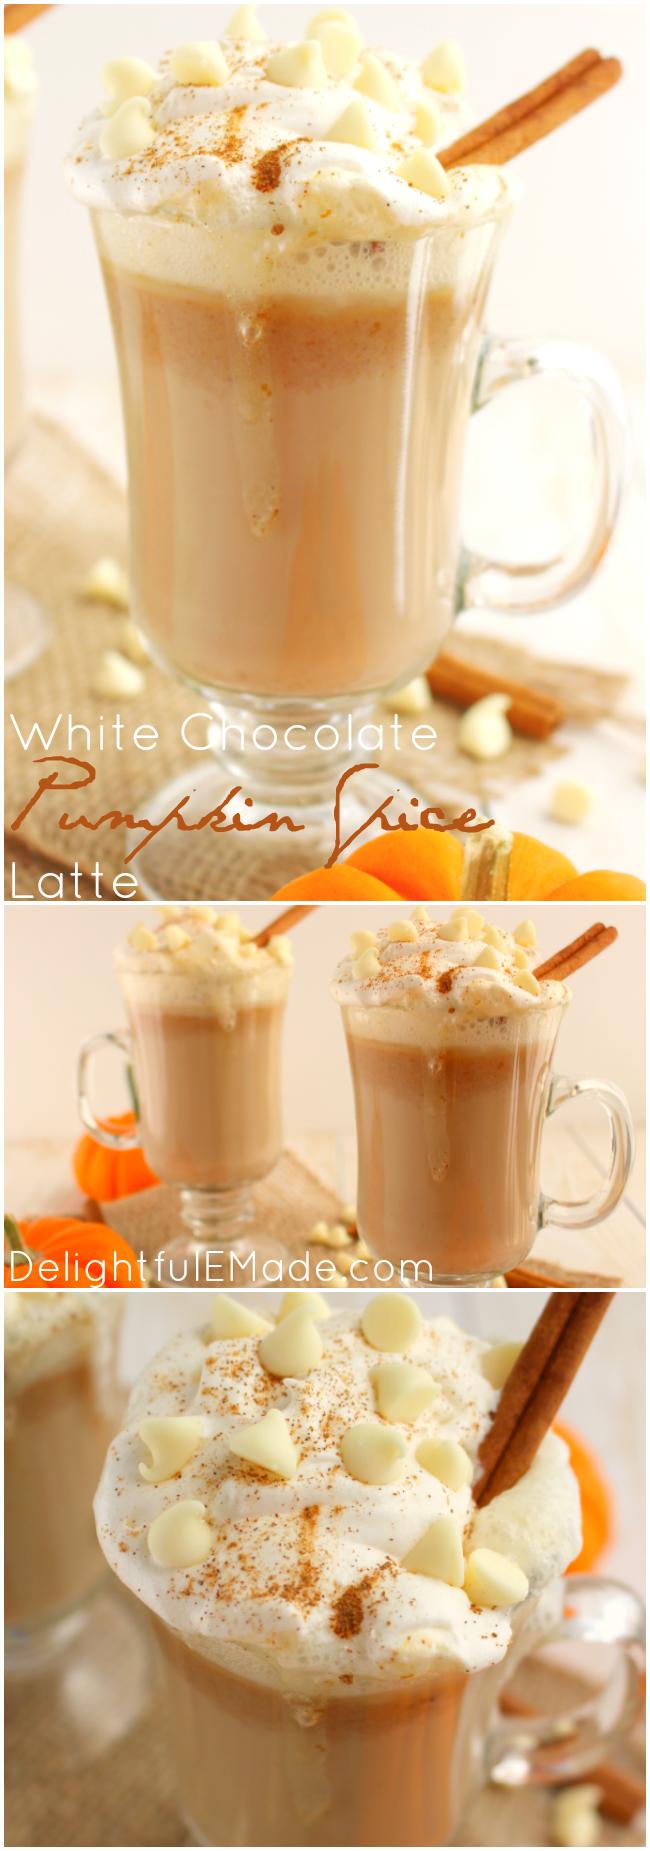 White Chocolate Pumpkin Spice Latte #falldrinks